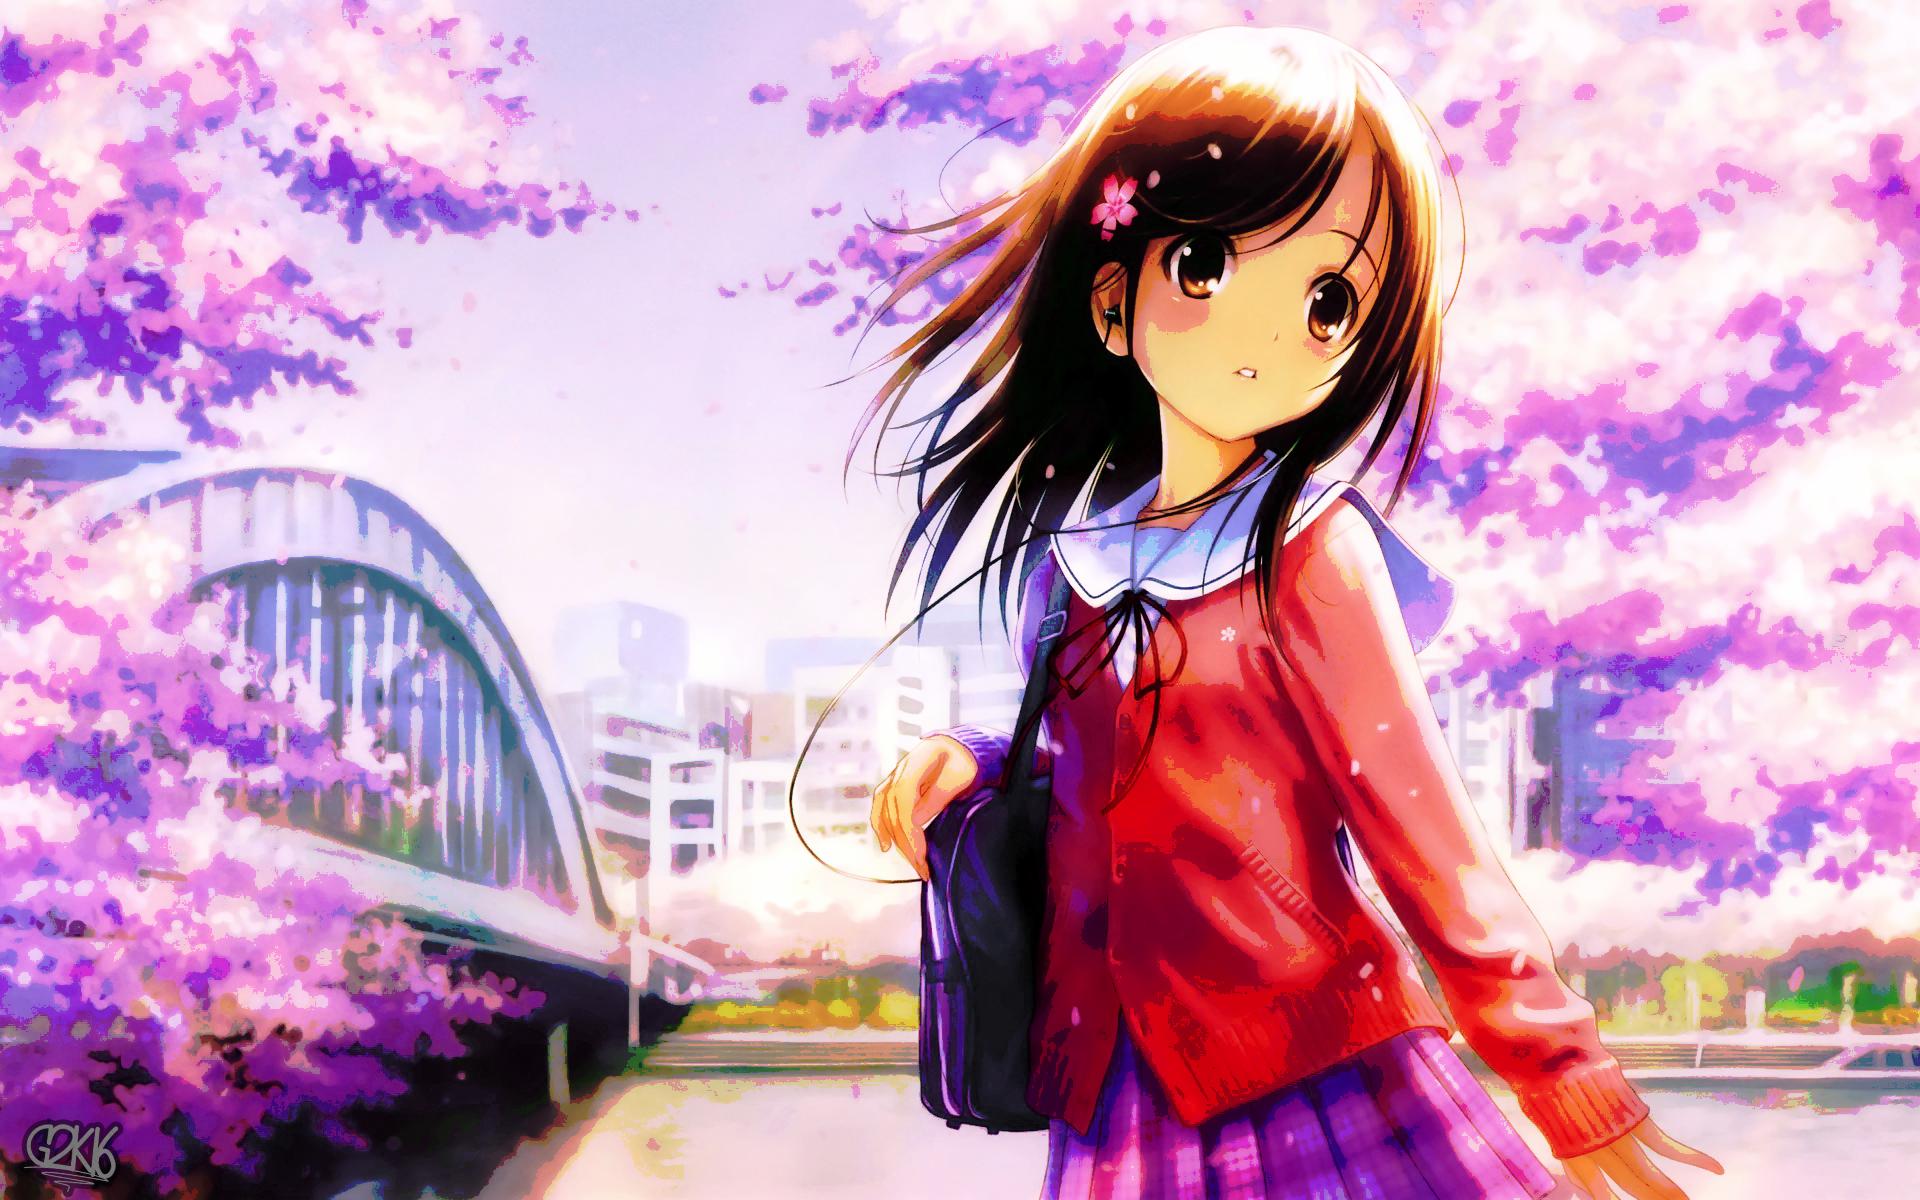 hinh nen anime girl dang yeu 9